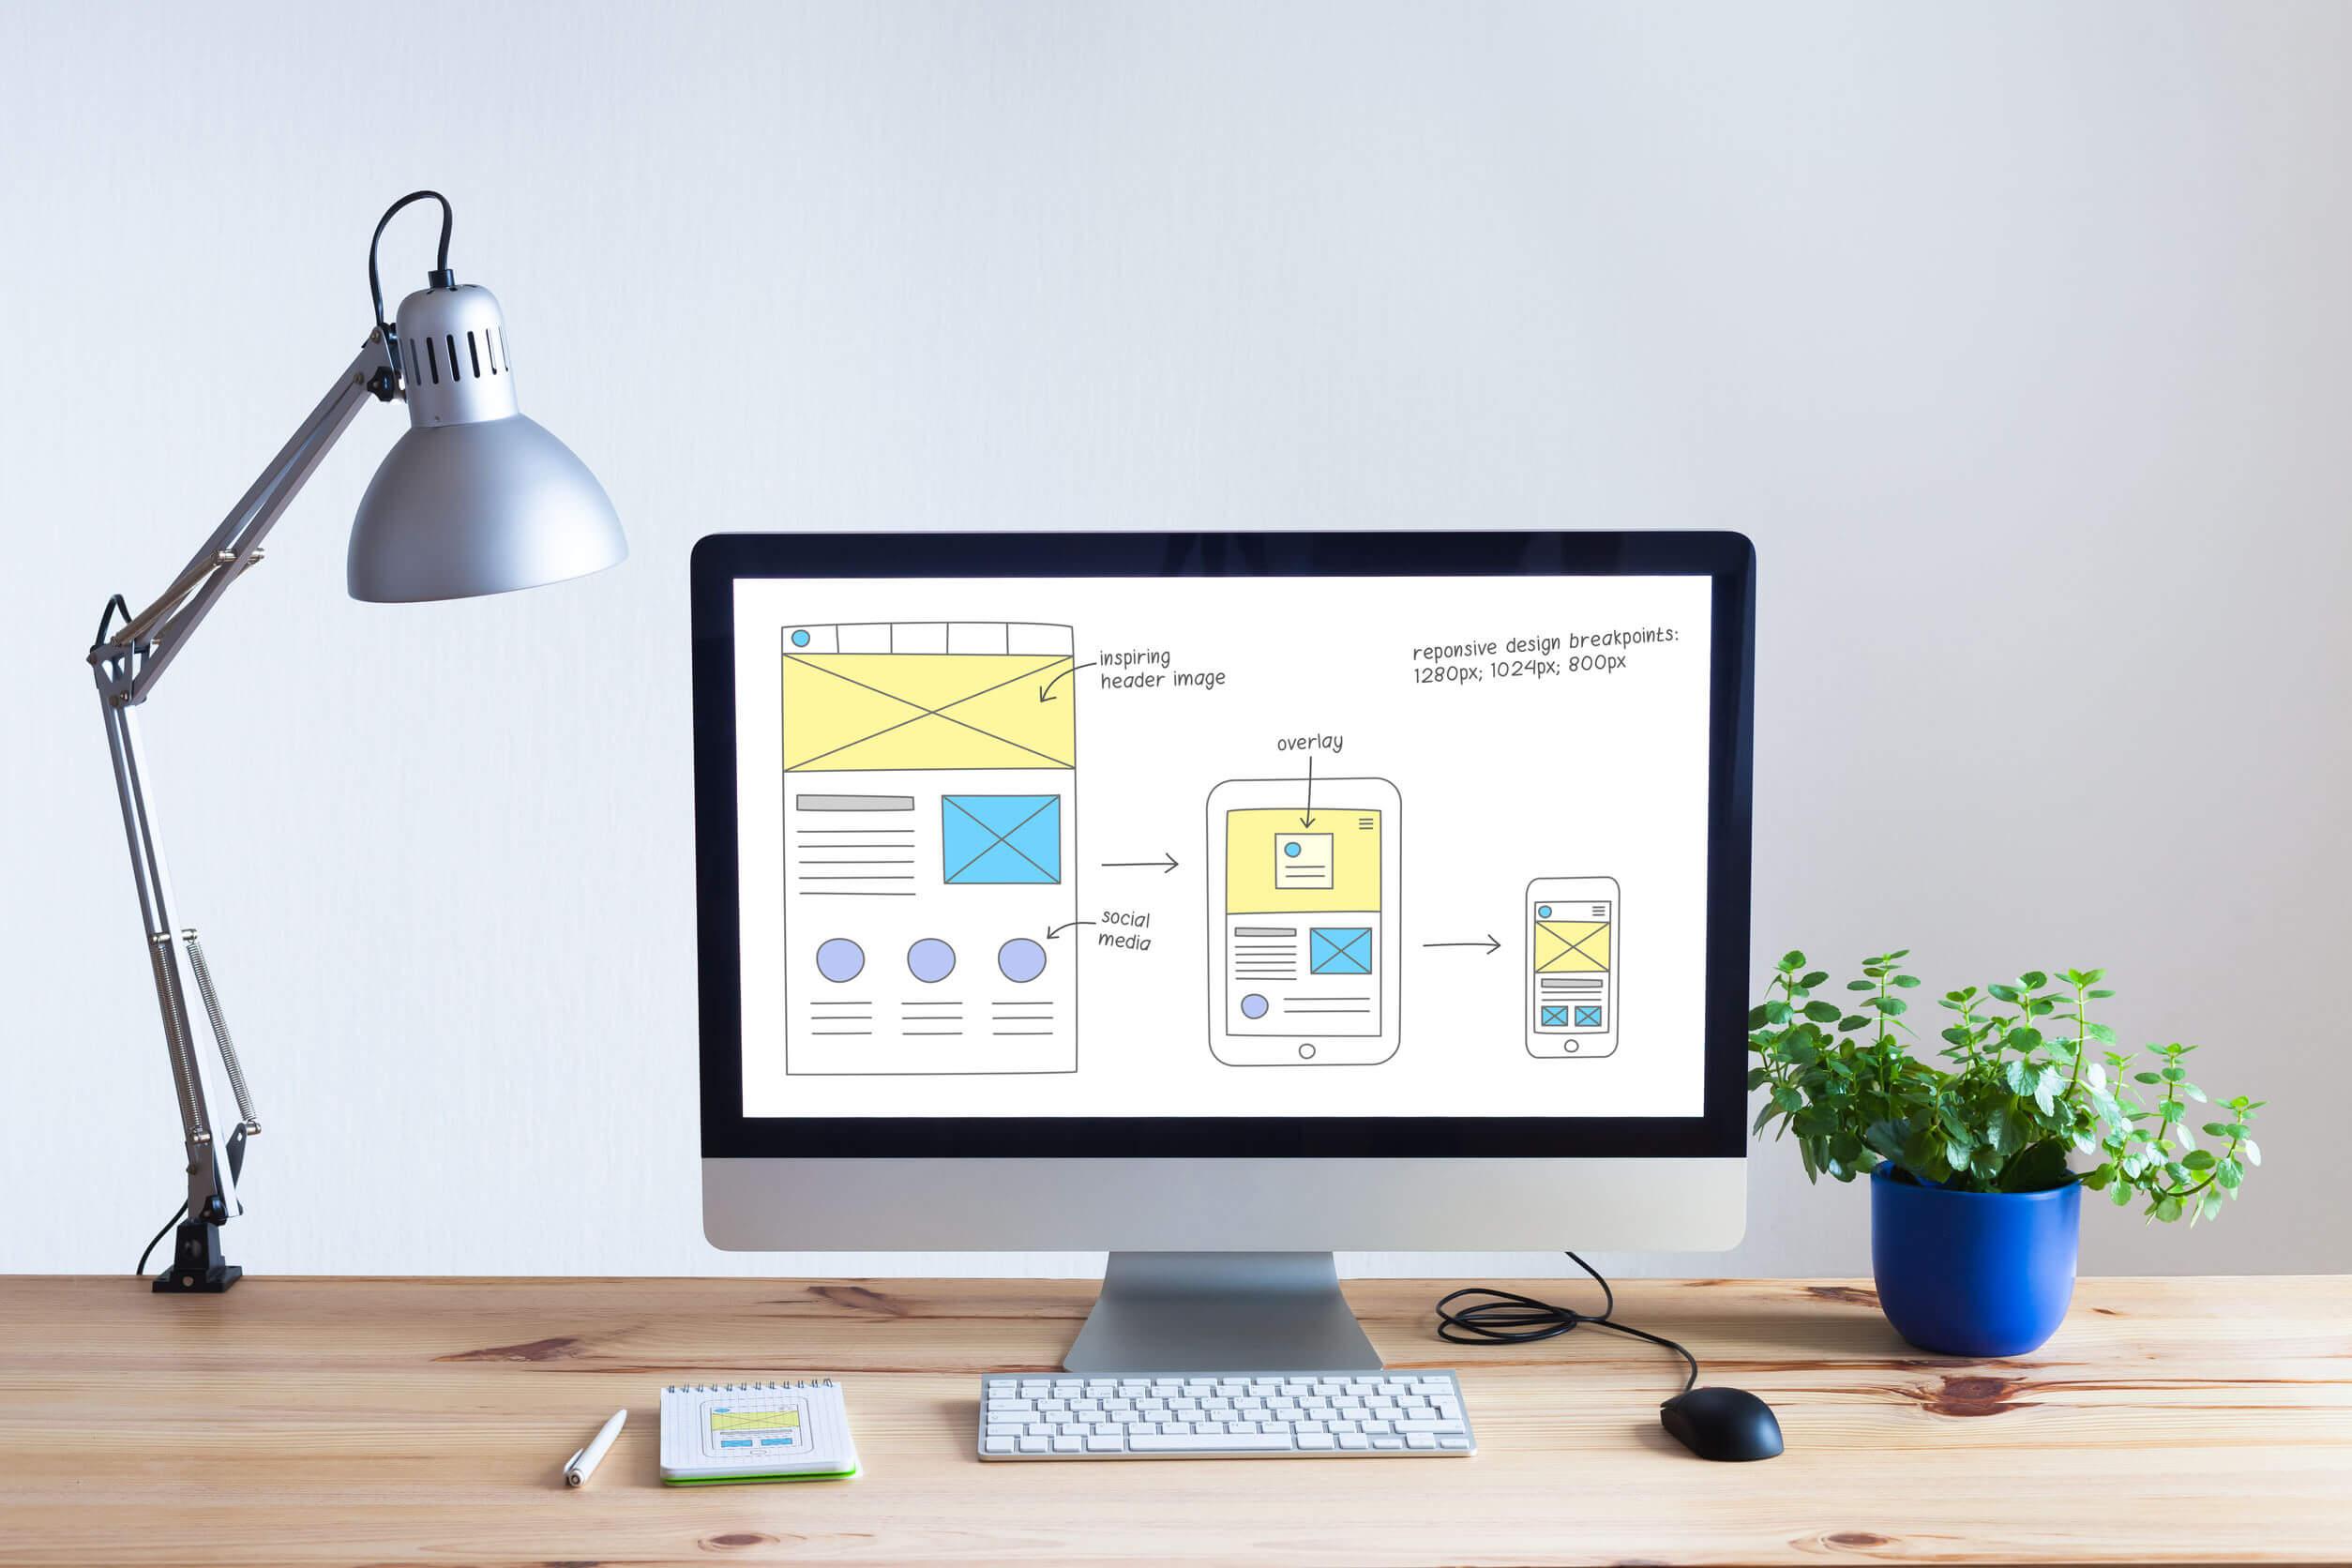 web design agency services salt lake city